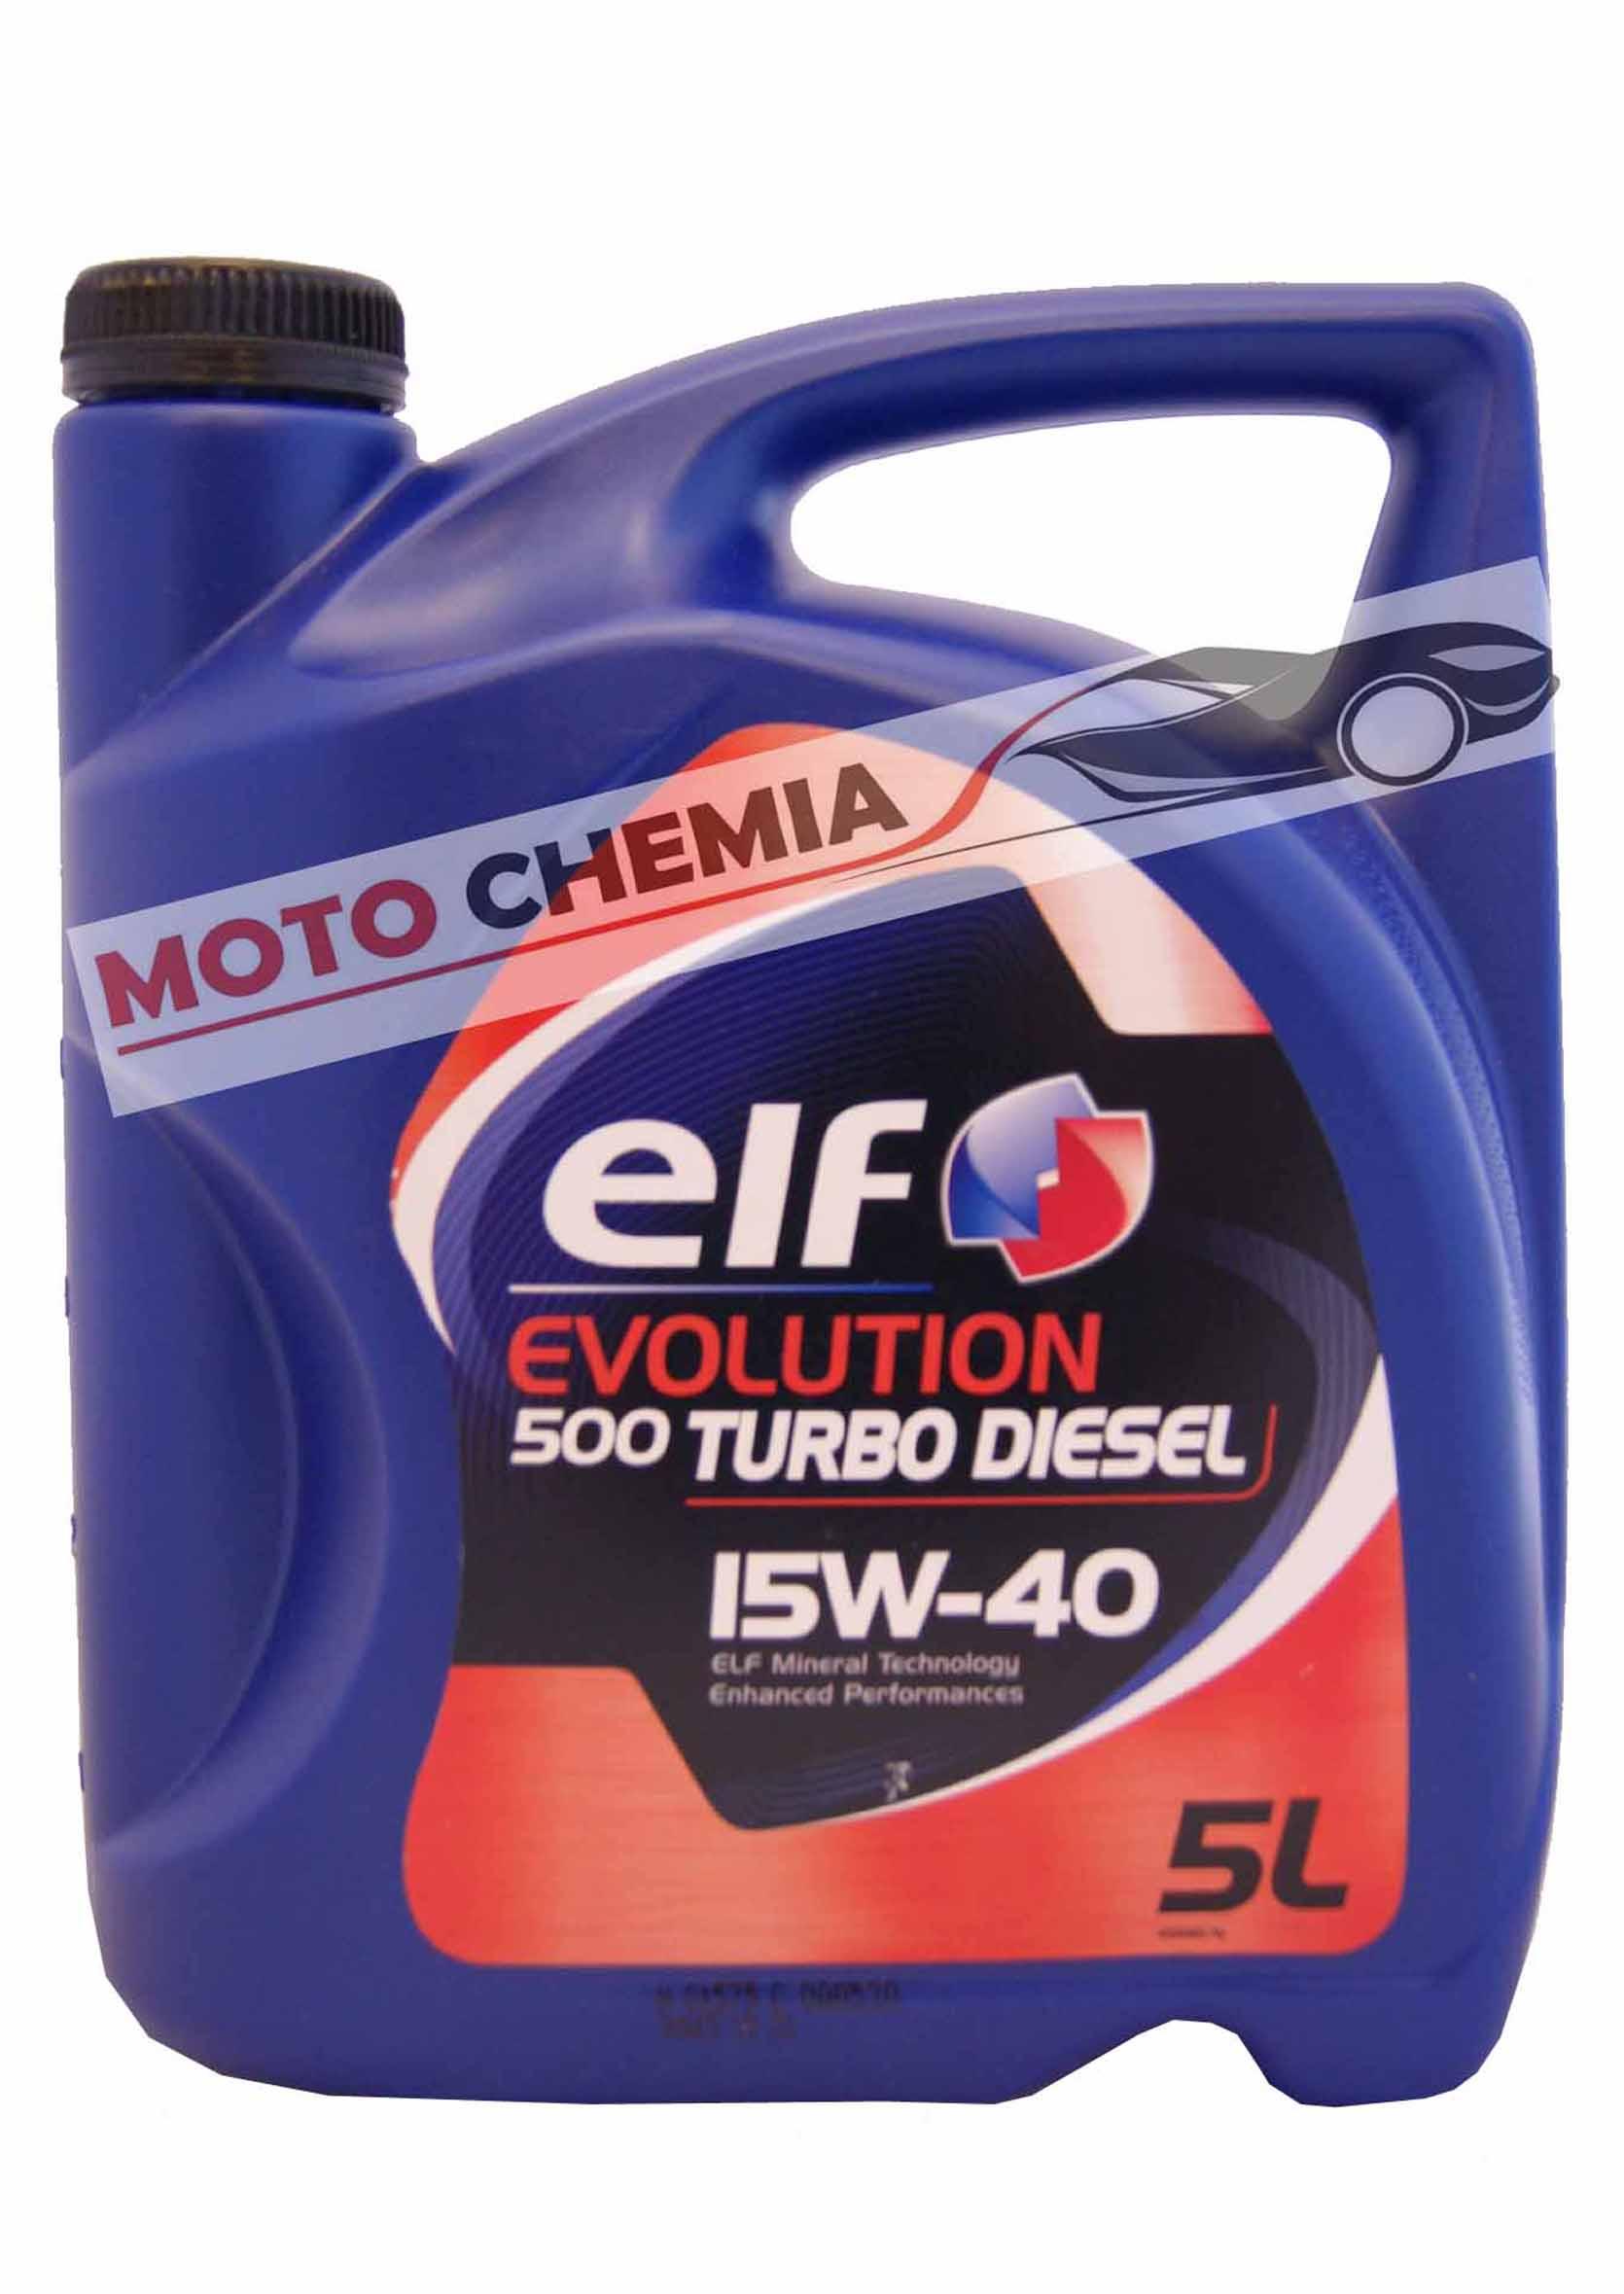 Elf Evolution 500 Turbo Diesel 15W40 5L Olej Silnikowy Mineralny